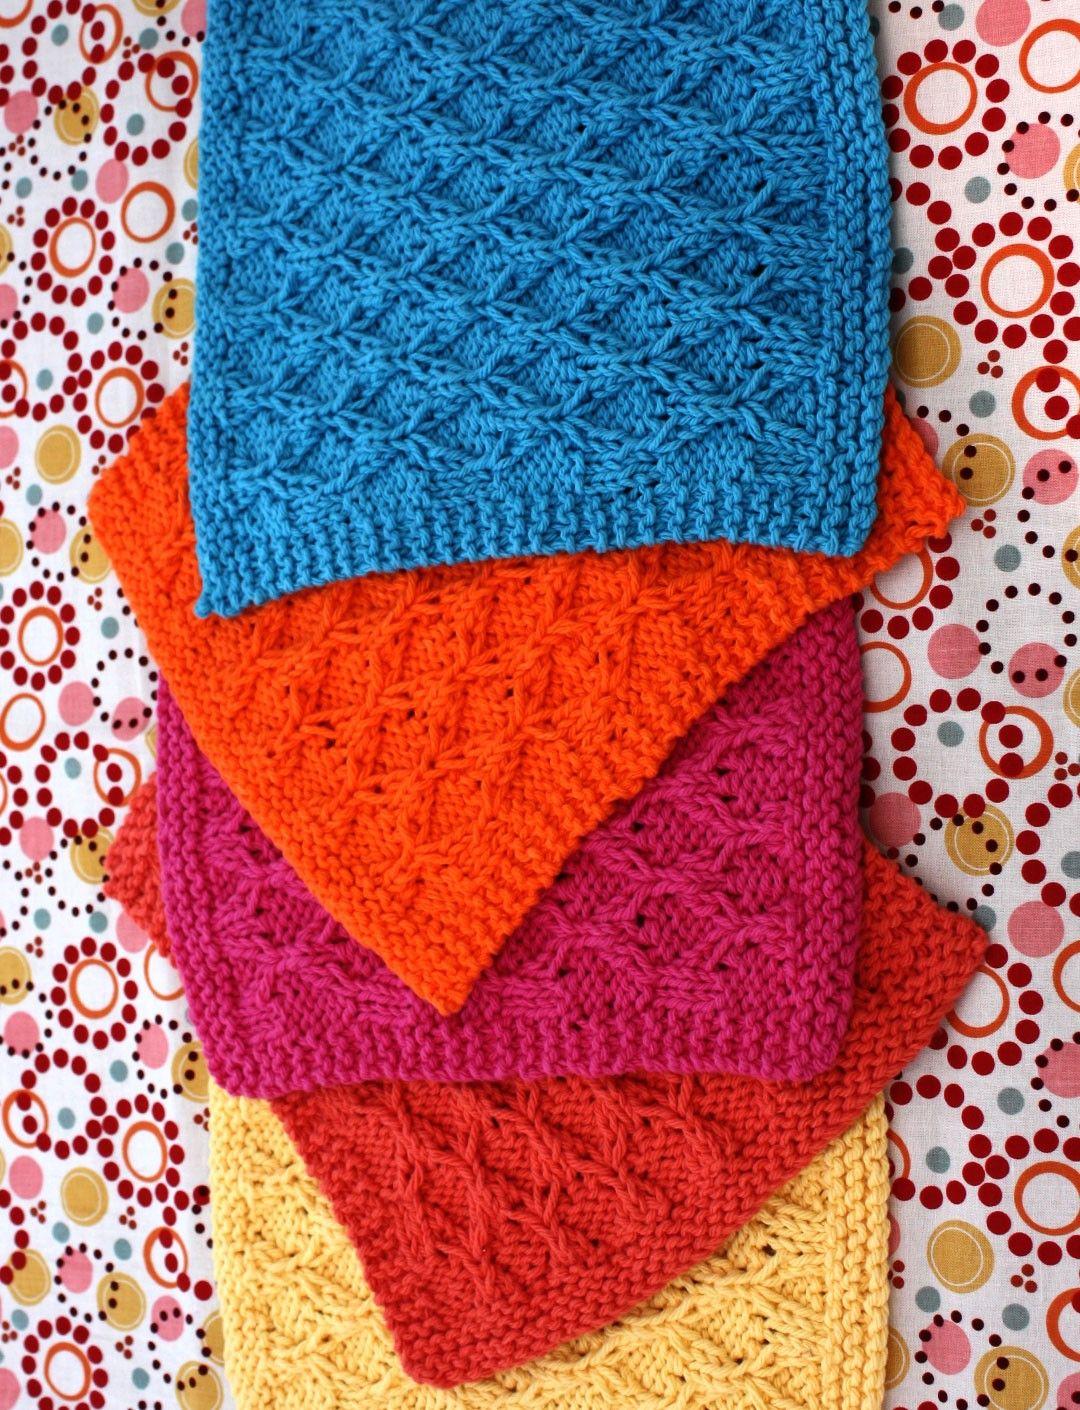 Yarnspirations.com - Lily Honeycomb Check Dishcloth - Patterns ...